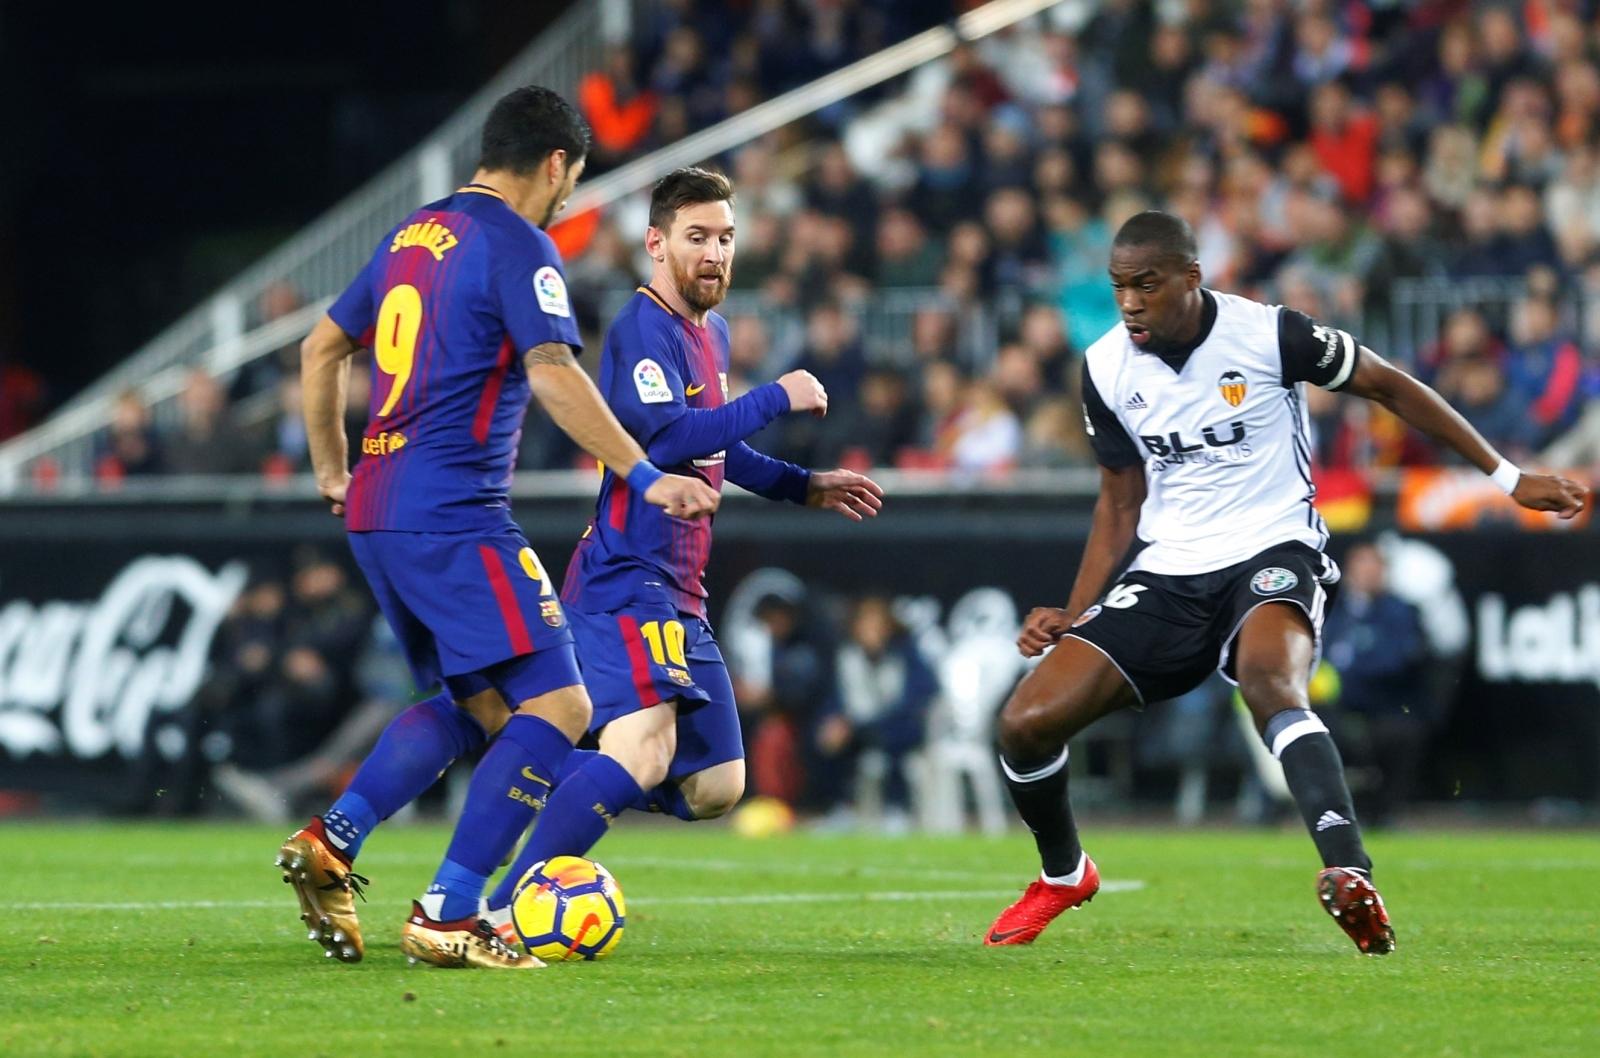 Valencia 0-0 Barcelona: La Liga - LIVE